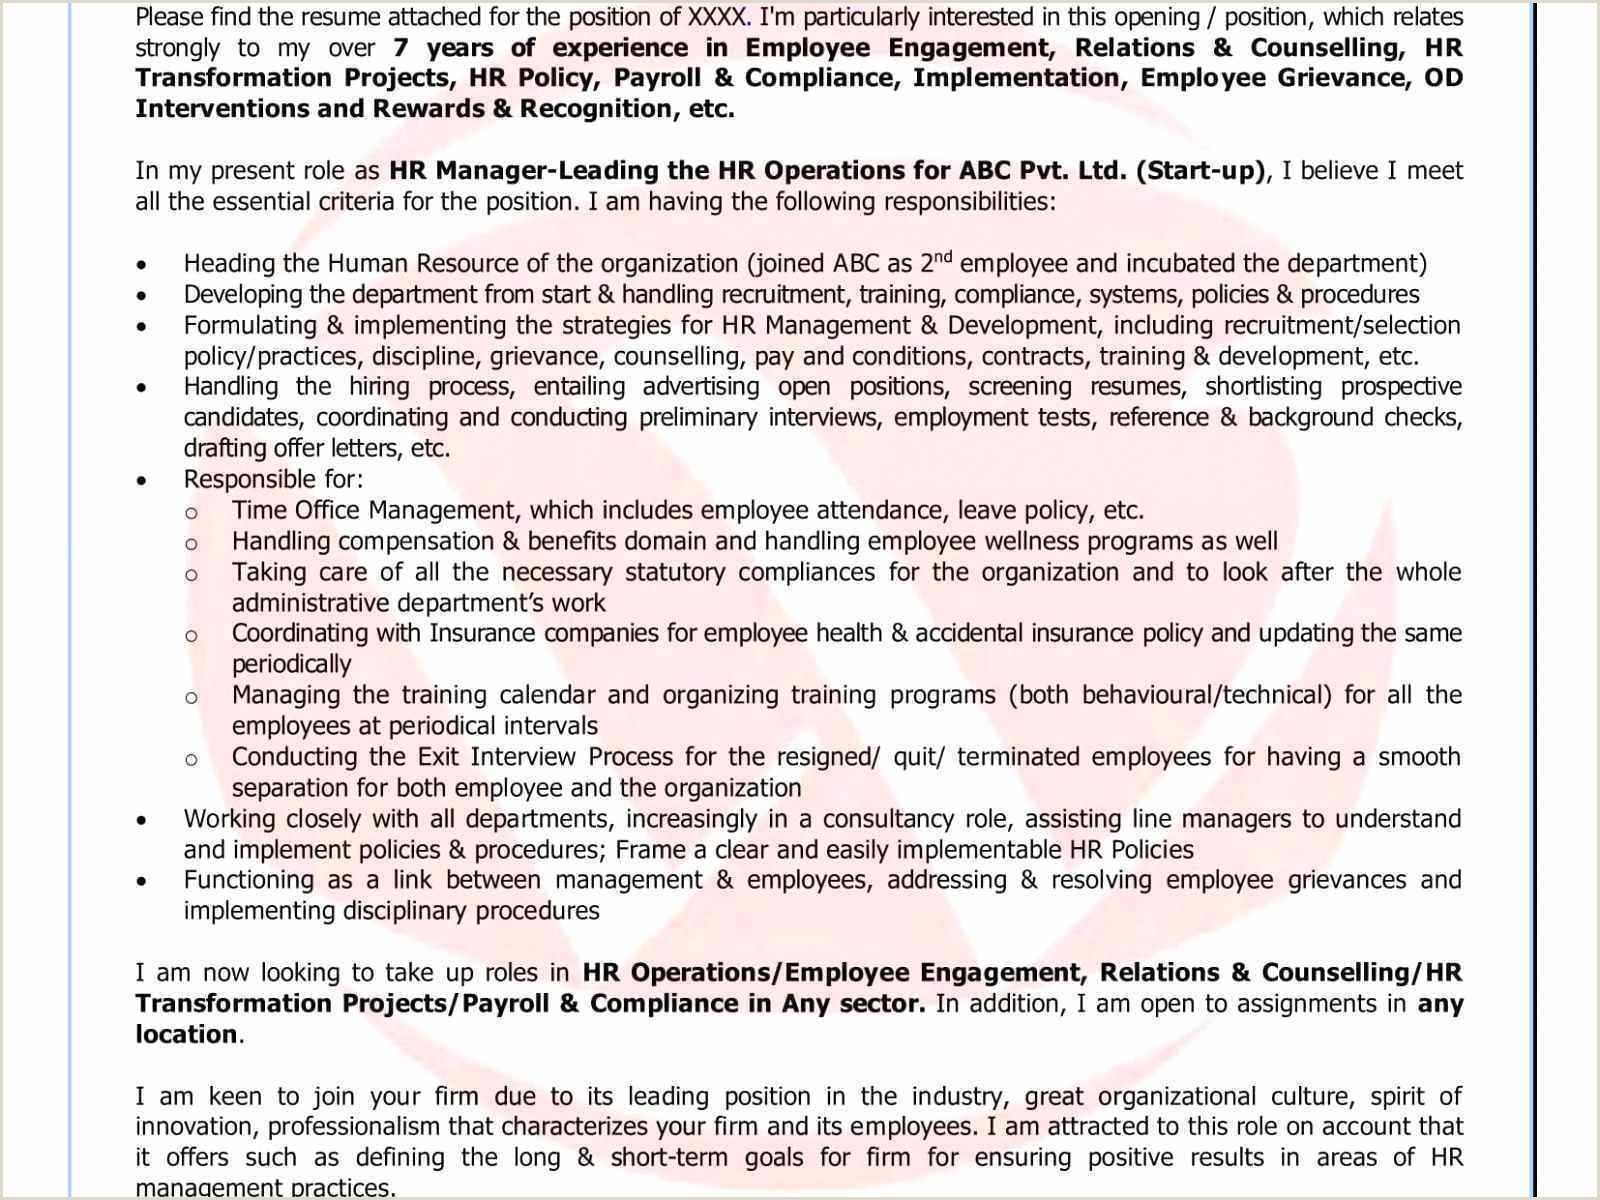 Resume format for Ca Job Cover Letter for Management Position New Cfo Resume Template